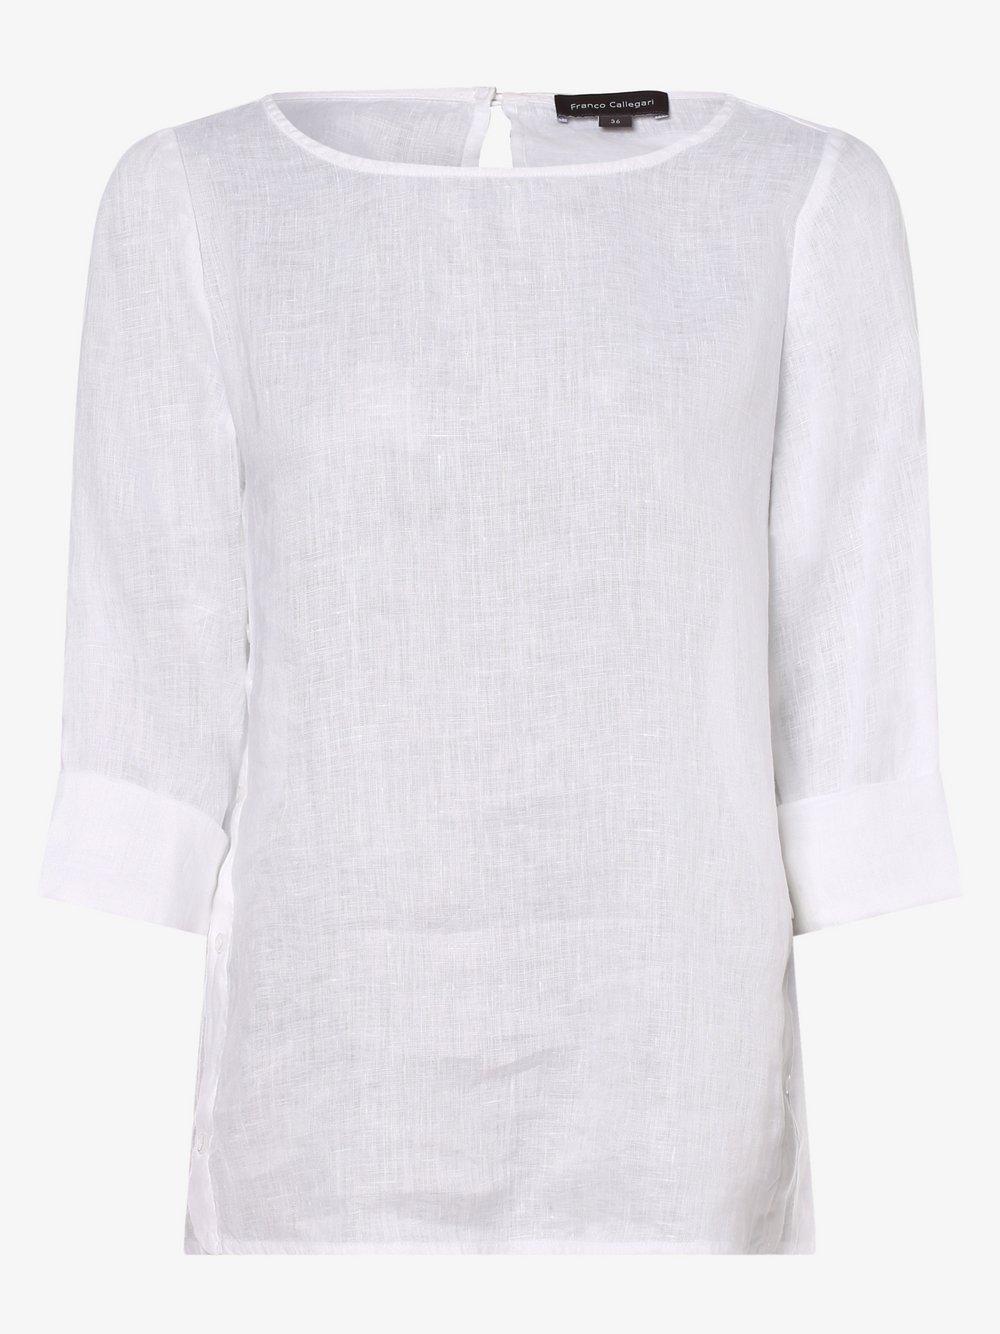 Franco Callegari – Bluzka damska z lnu, biały Van Graaf 462663-0001